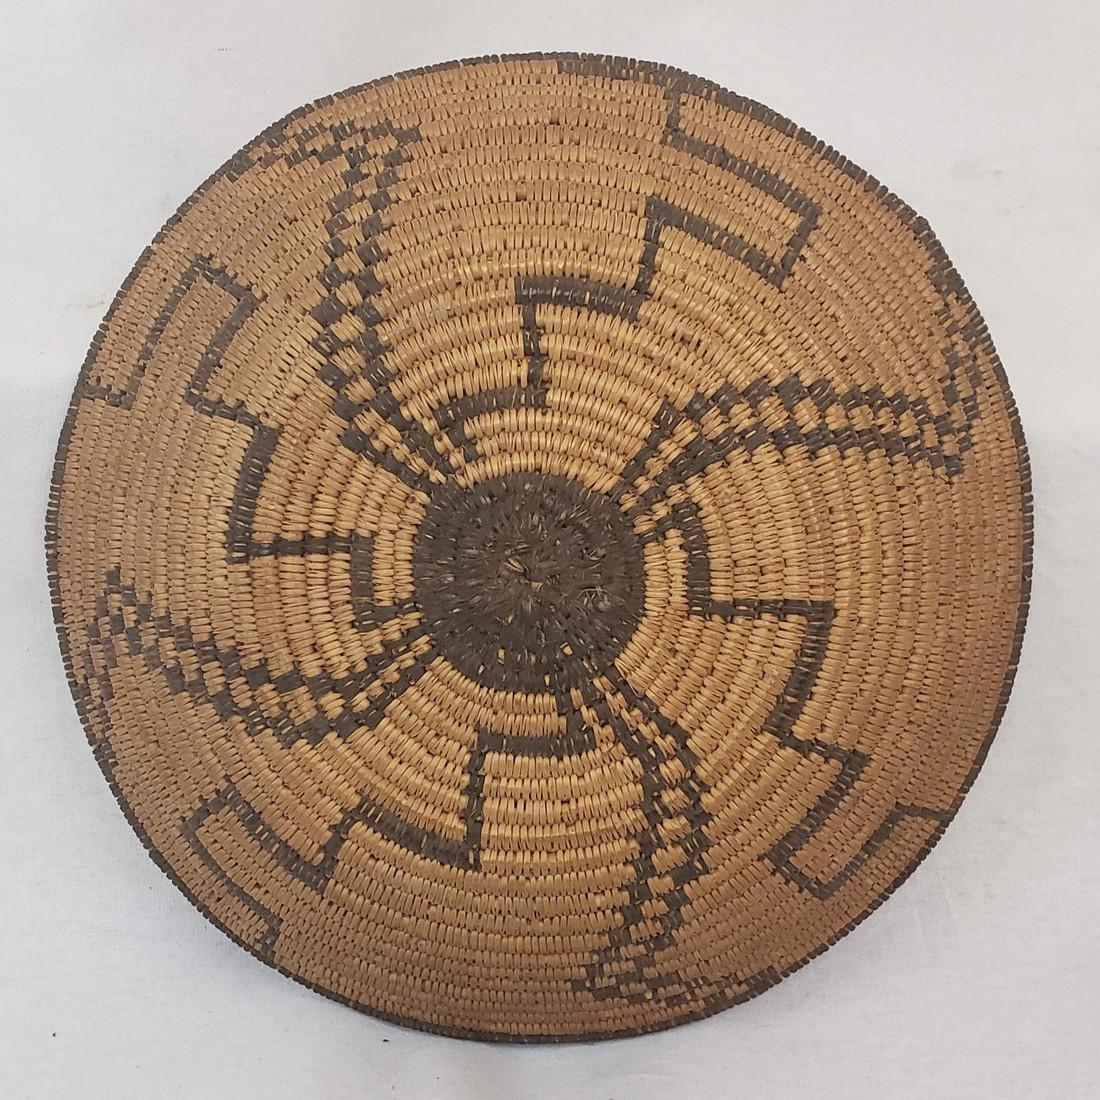 Fine Apache geometric basket ca 1900-1920 - 3